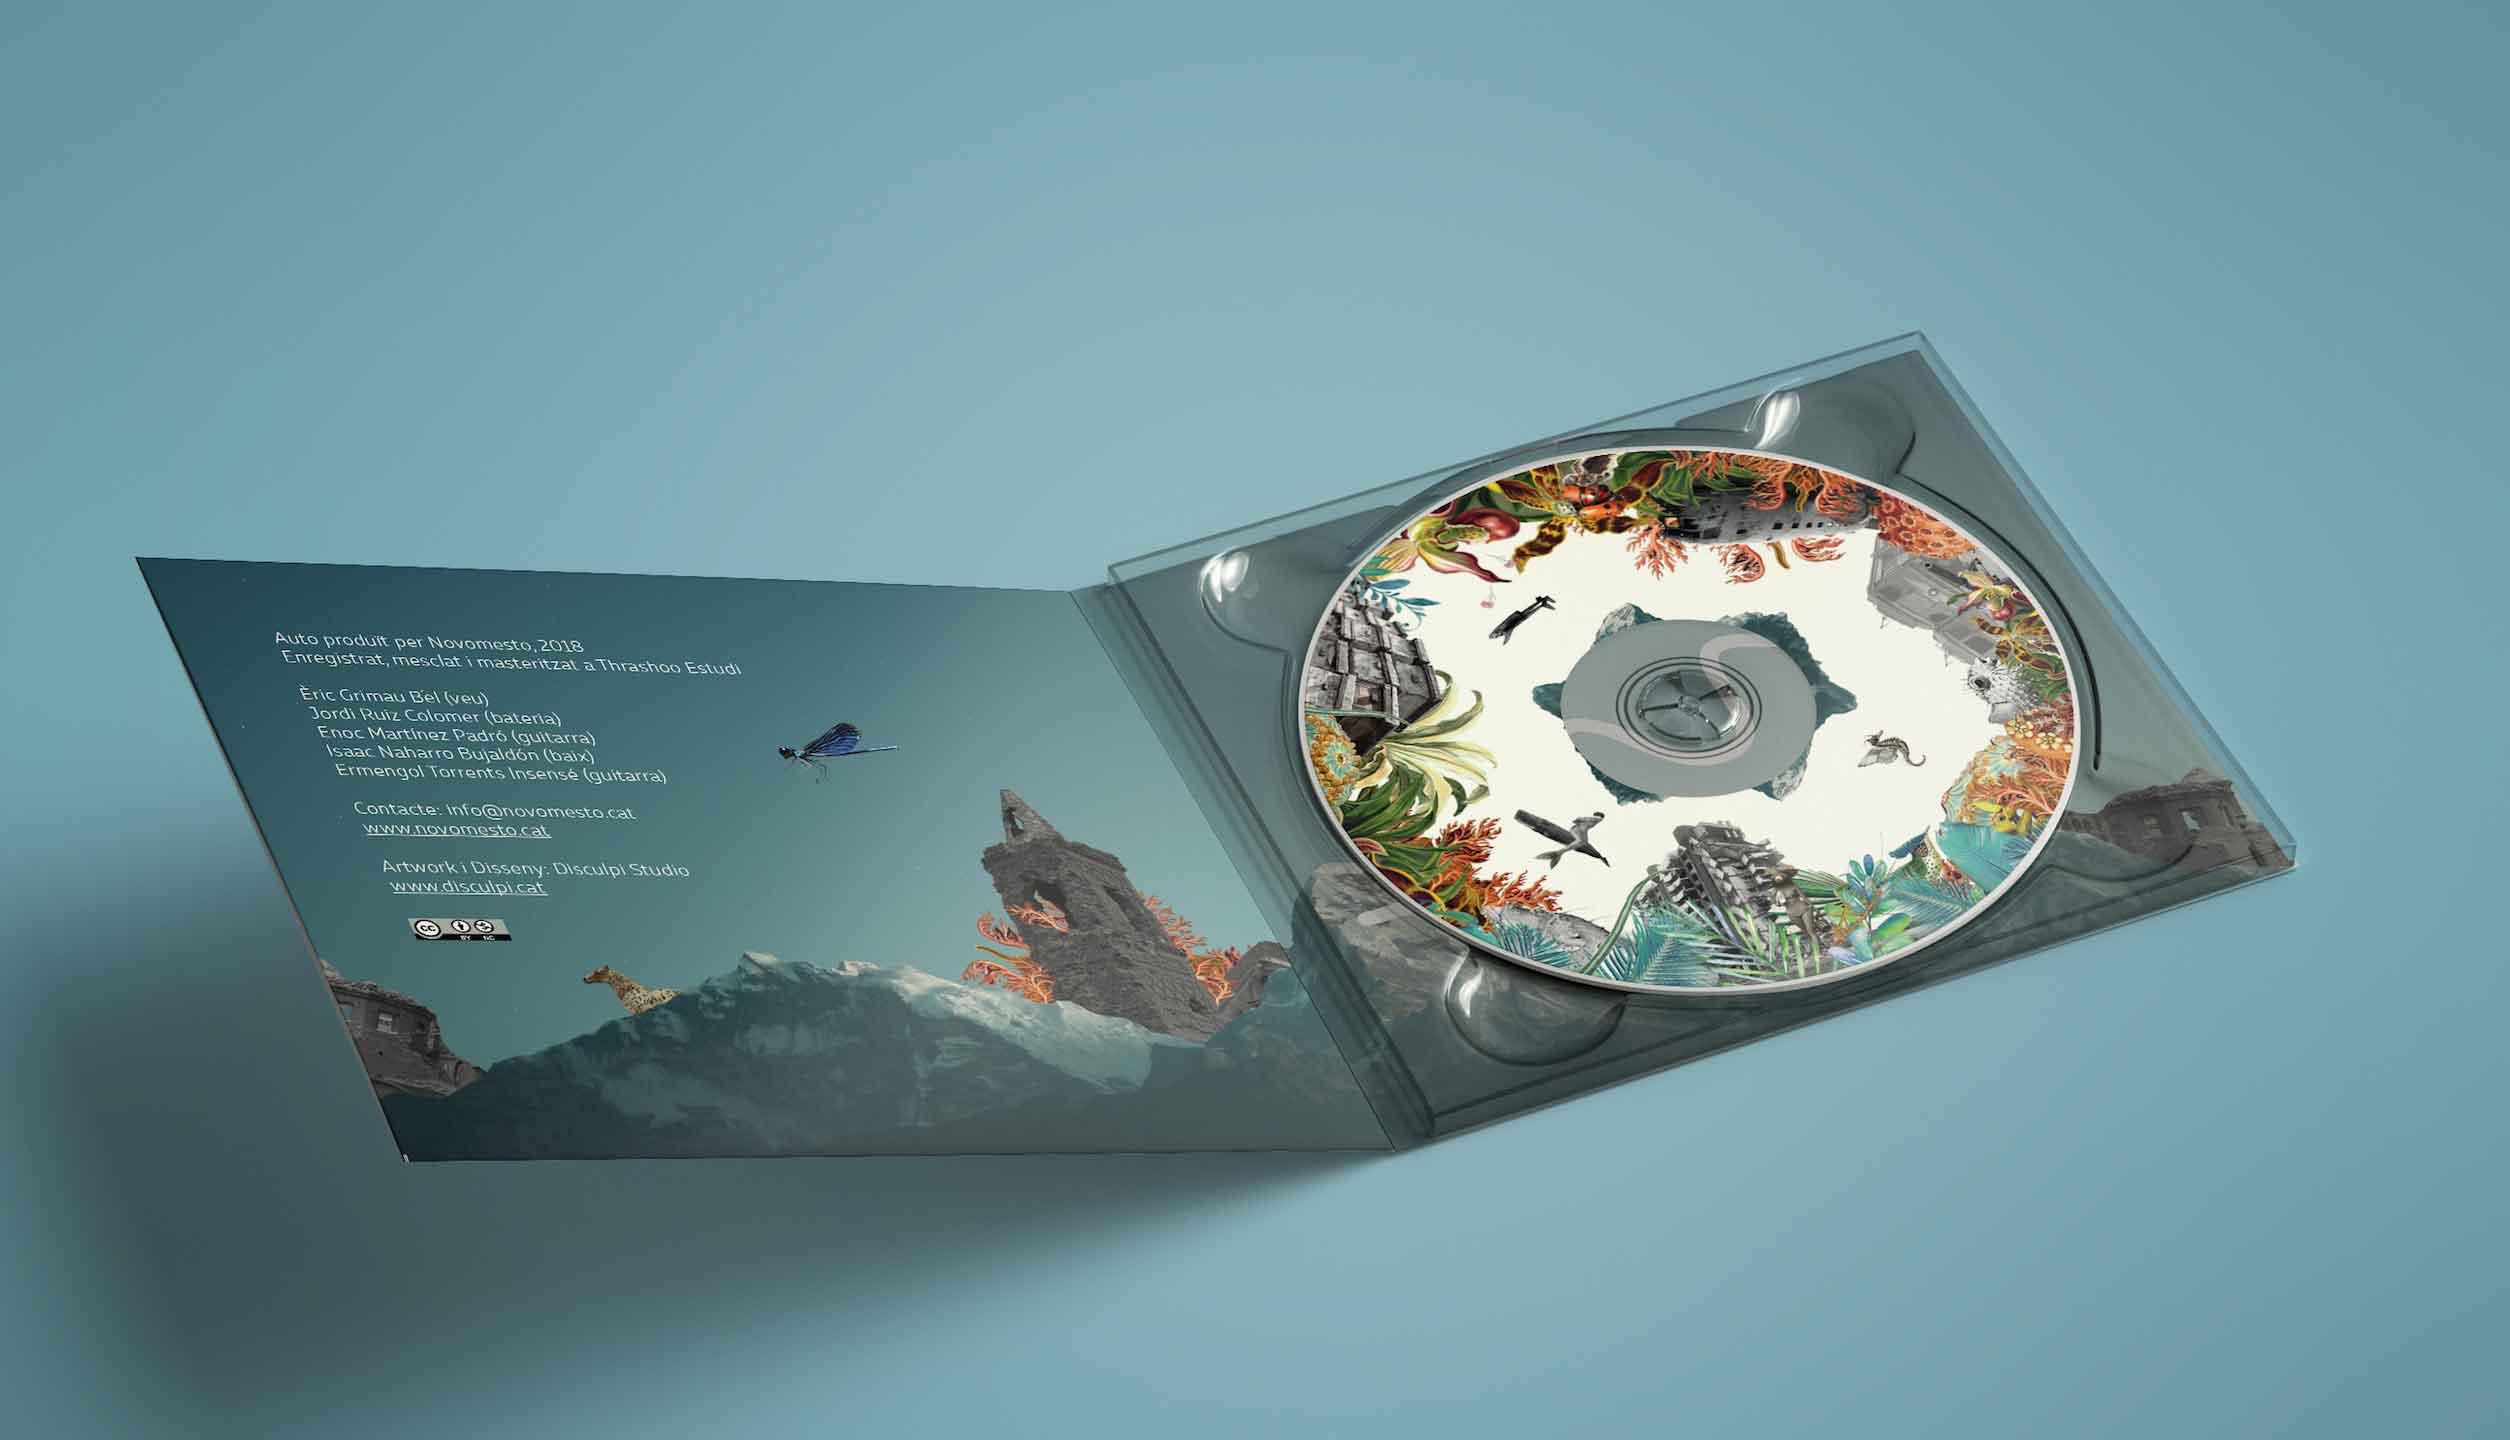 Novomesto-DisculpiStudio-Design